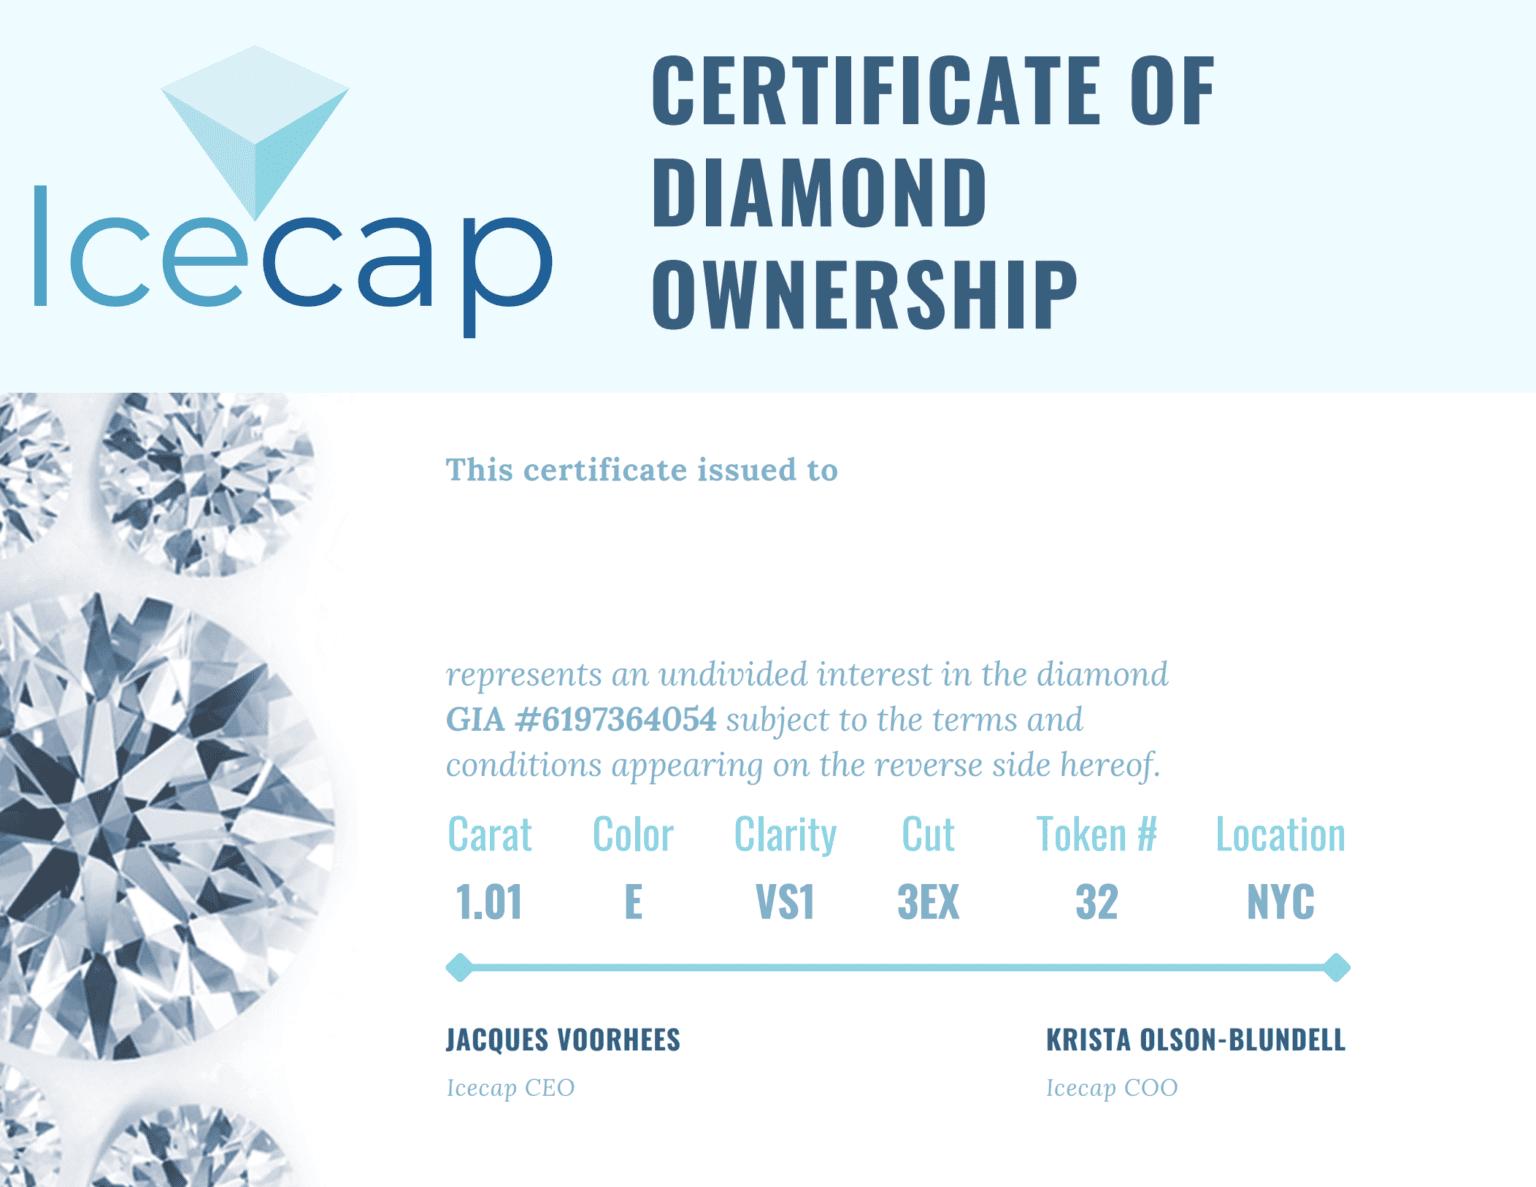 Sample Certificate of Diamond Ownership